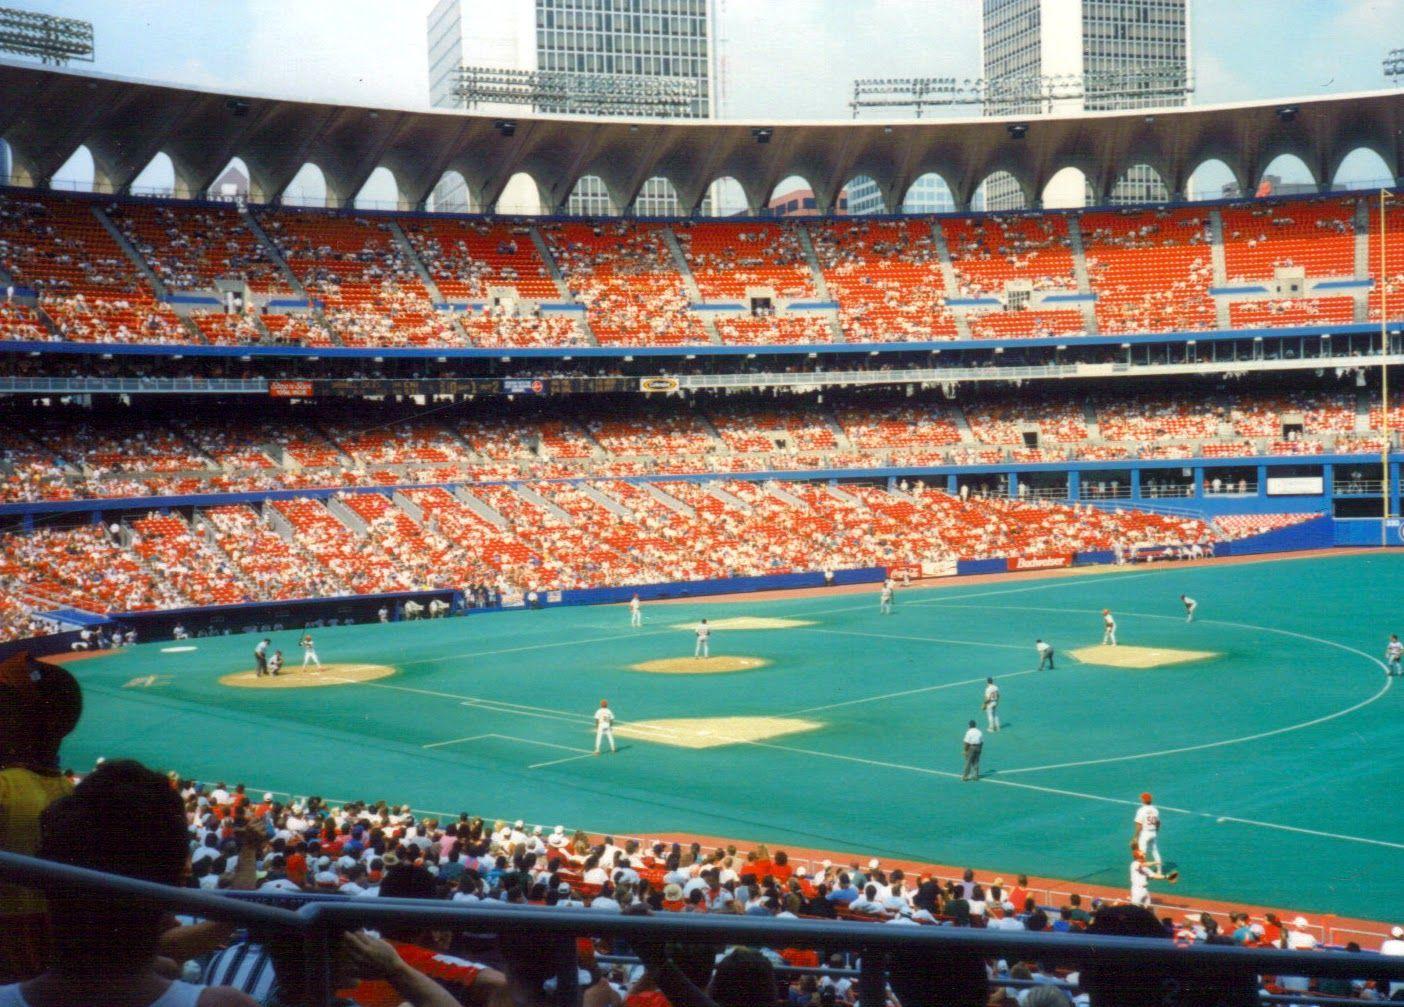 The Astroturf At Old Busch Stadium Busch Stadium Major League Baseball Stadiums Stadium